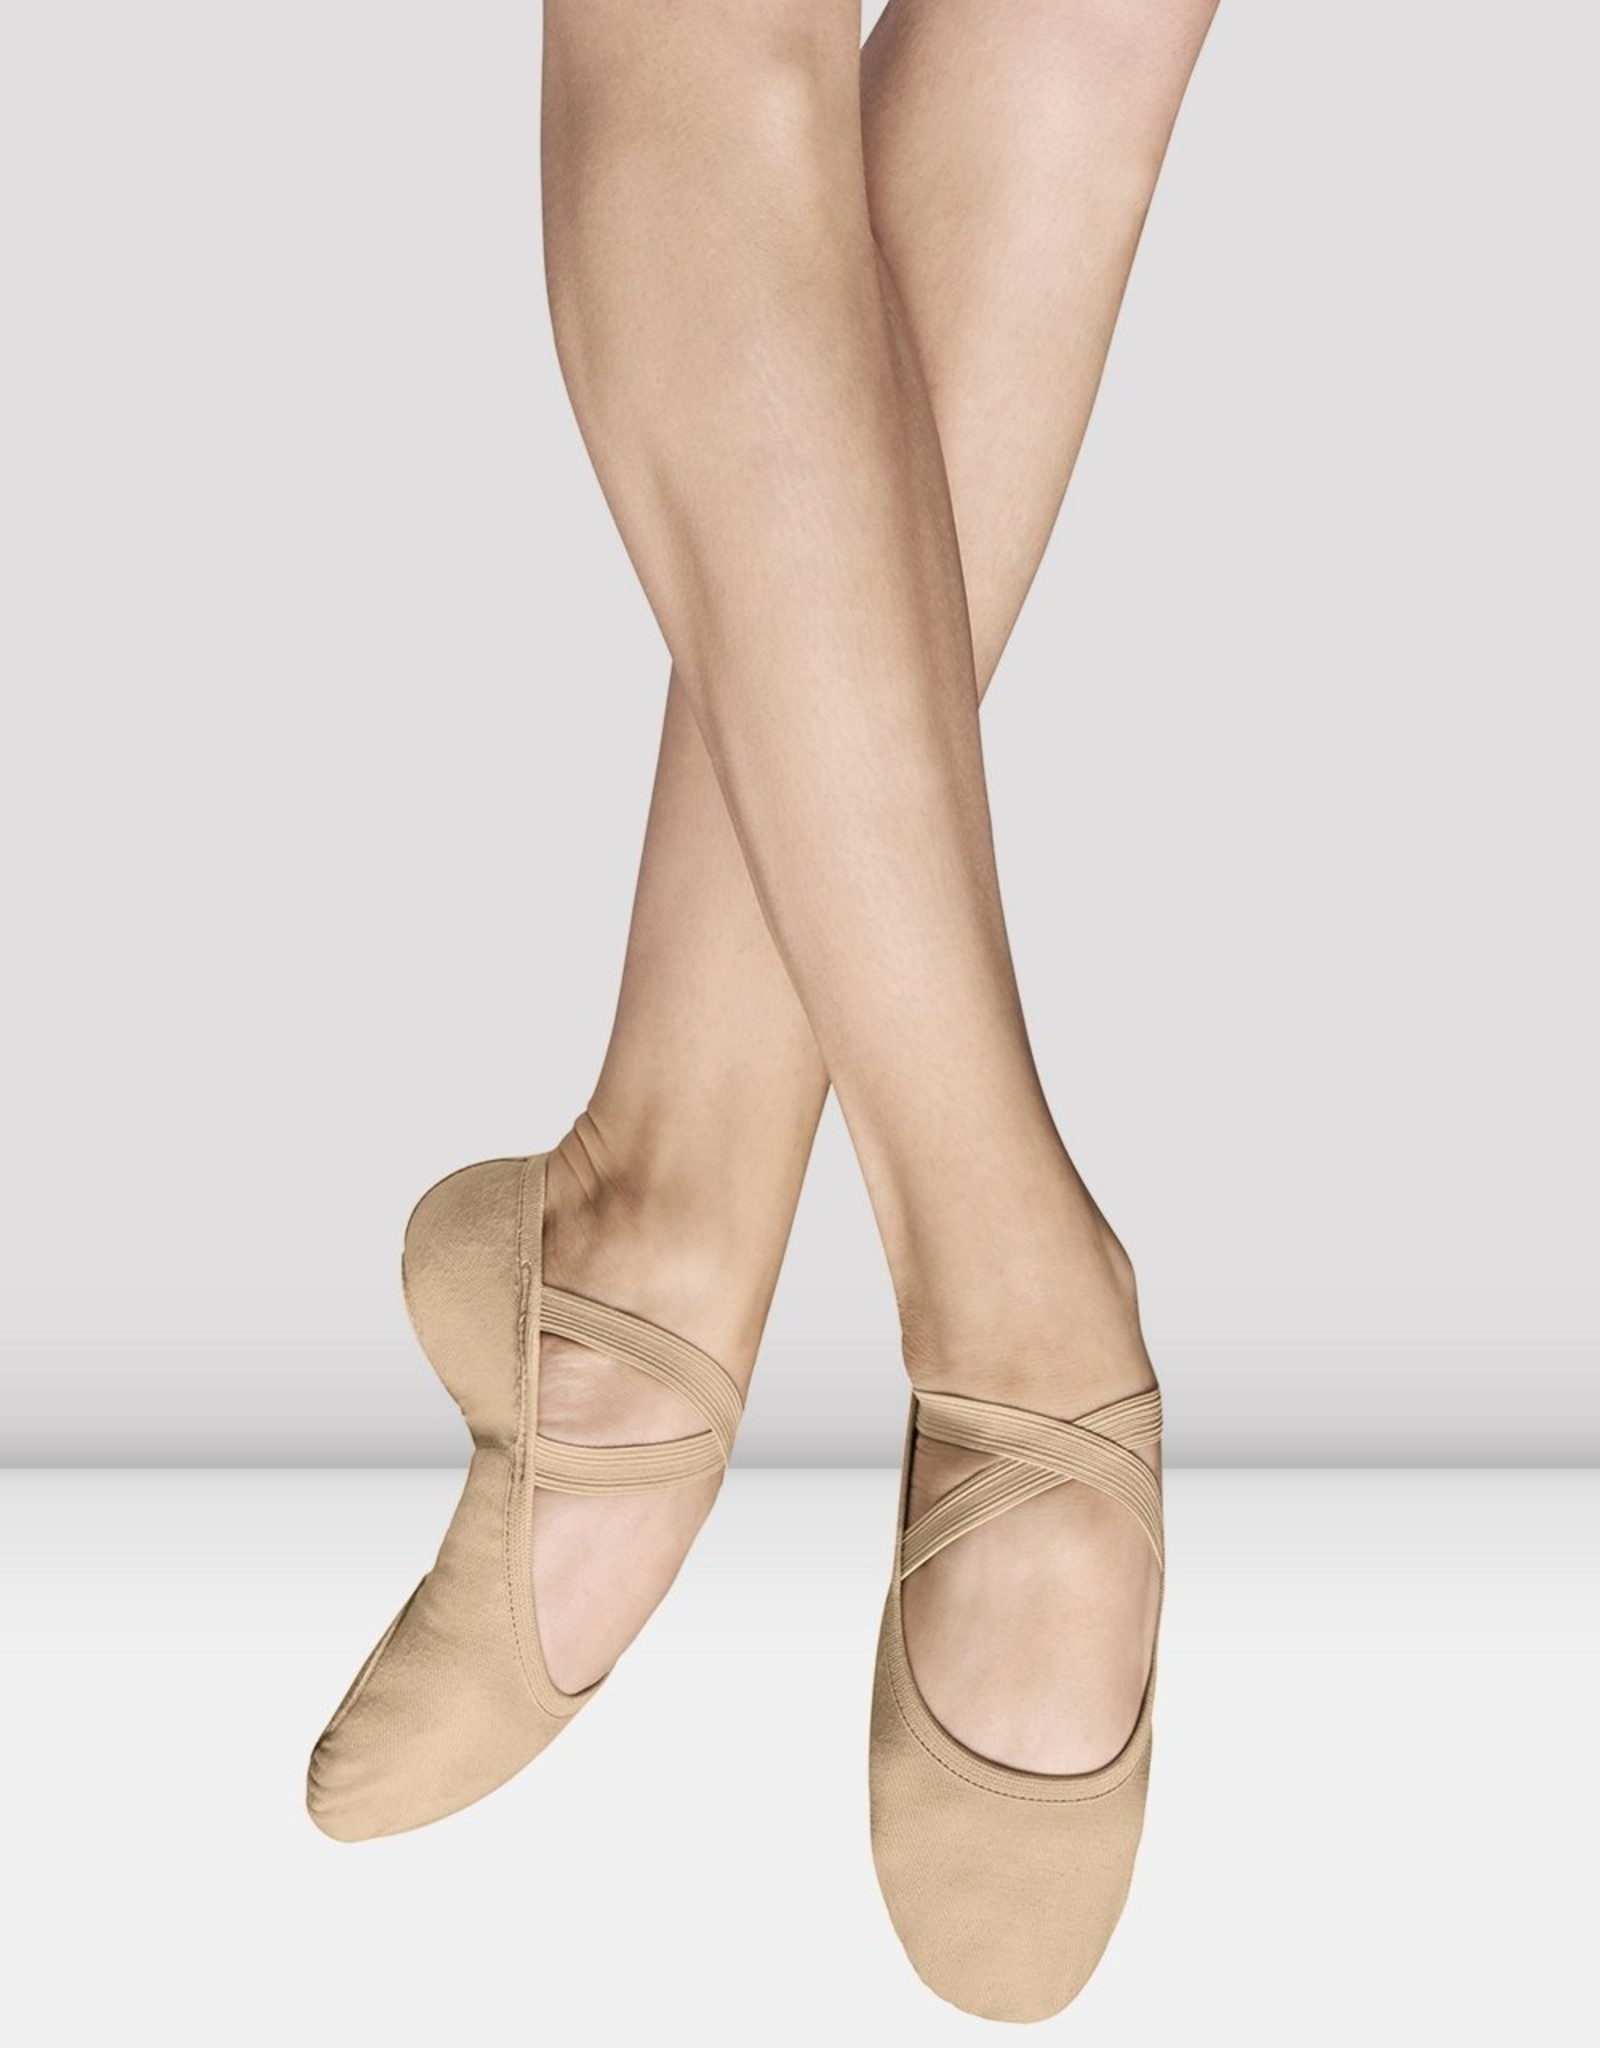 Bloch Bloch Ladies Performa Ballet Shoe - S0284L